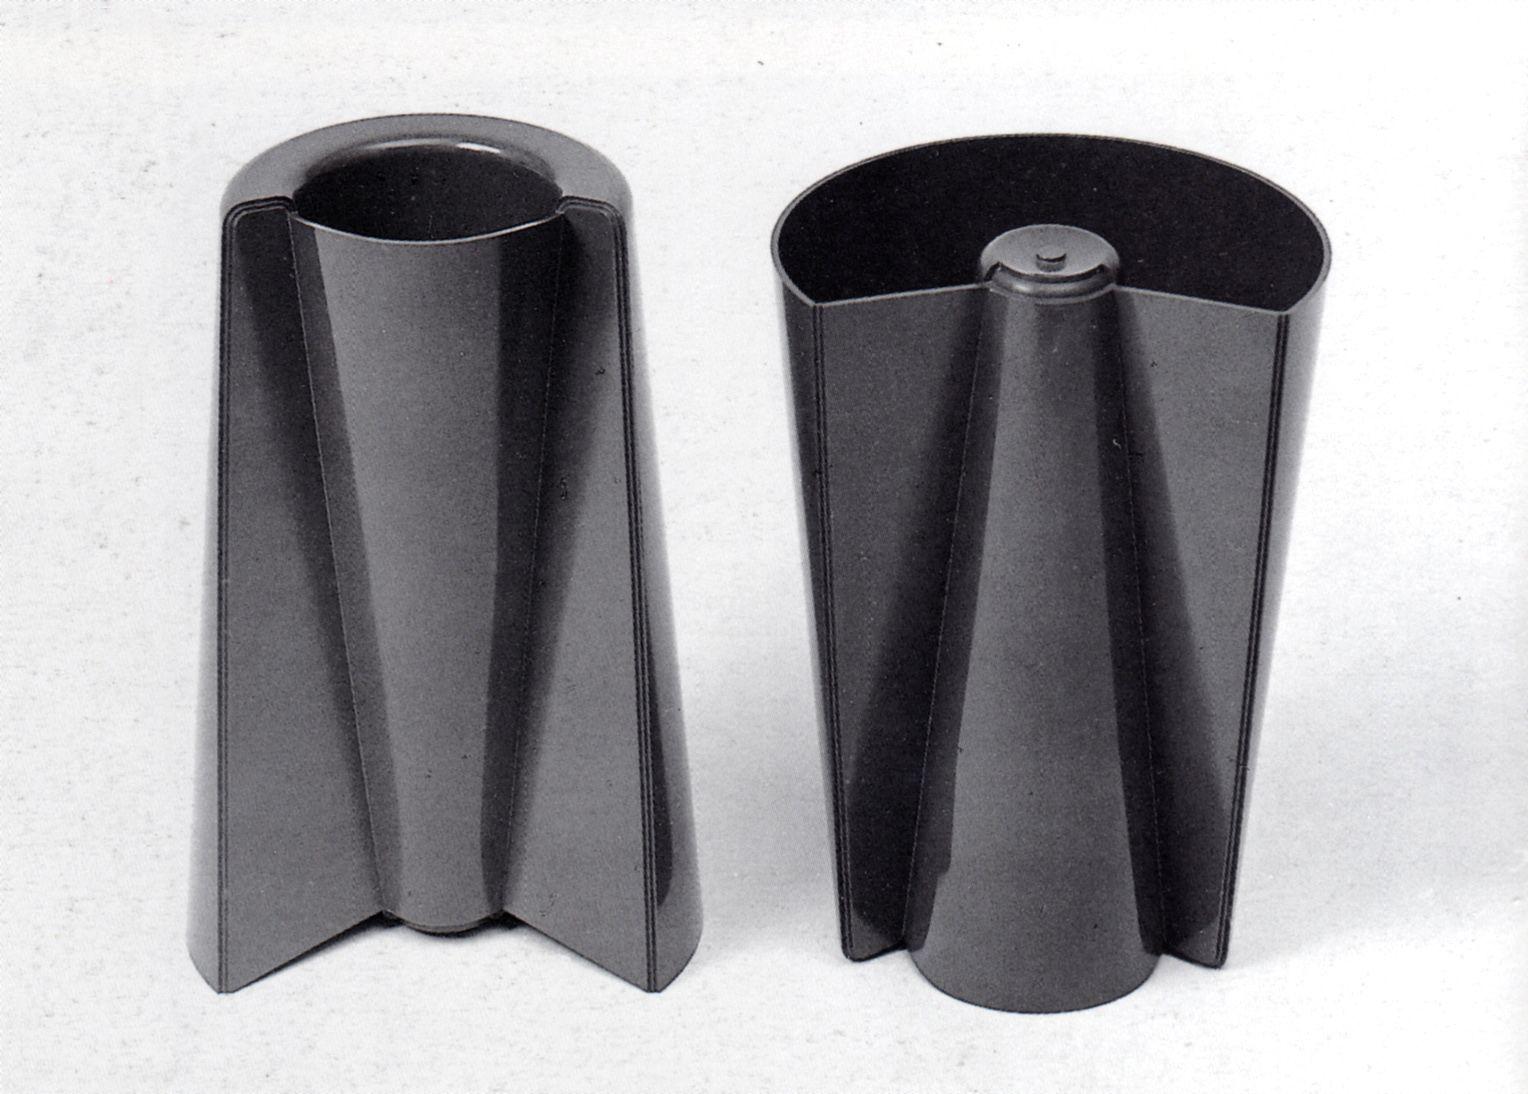 enzo mari vaso pago pago 1968 edizioni danese house accessories pinterest. Black Bedroom Furniture Sets. Home Design Ideas